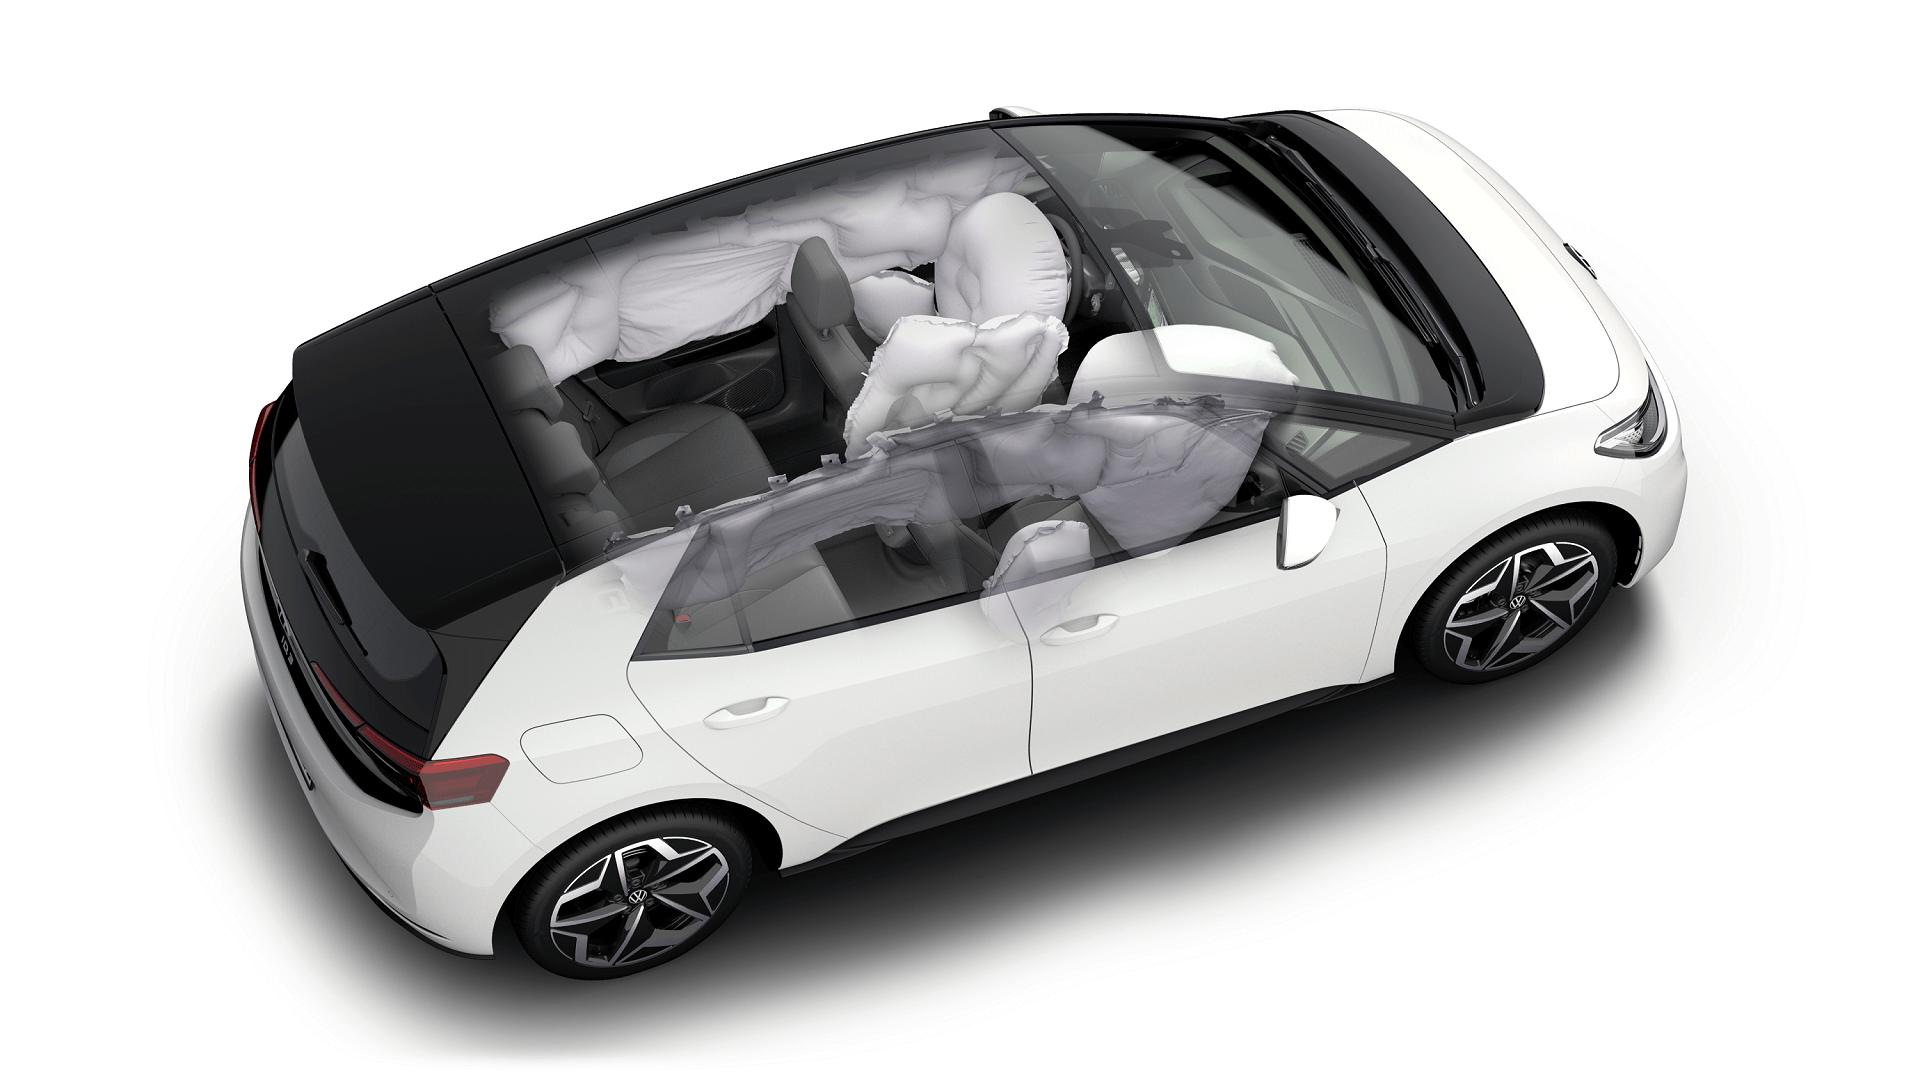 VW ID.3 - Emergency System που περιλαμβάνει και έναν κεντρικό αερόσακο